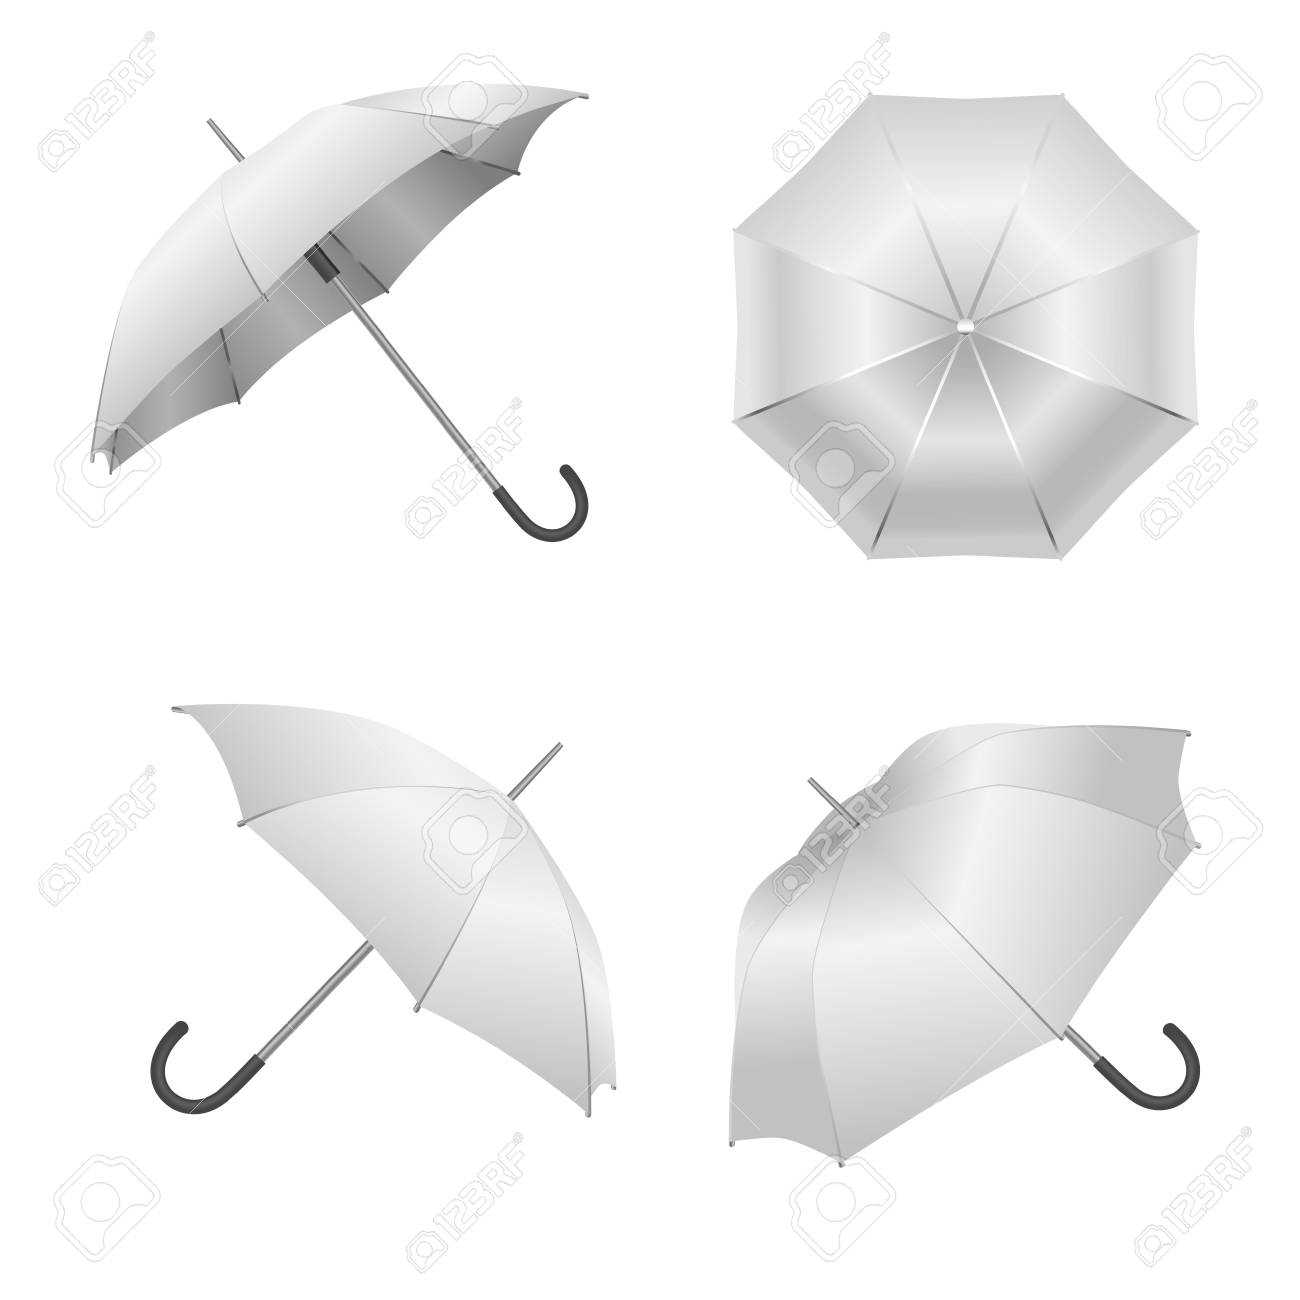 Realistic Detailed 3D White Blank Umbrella Template Mockup Set.. Throughout Blank Umbrella Template